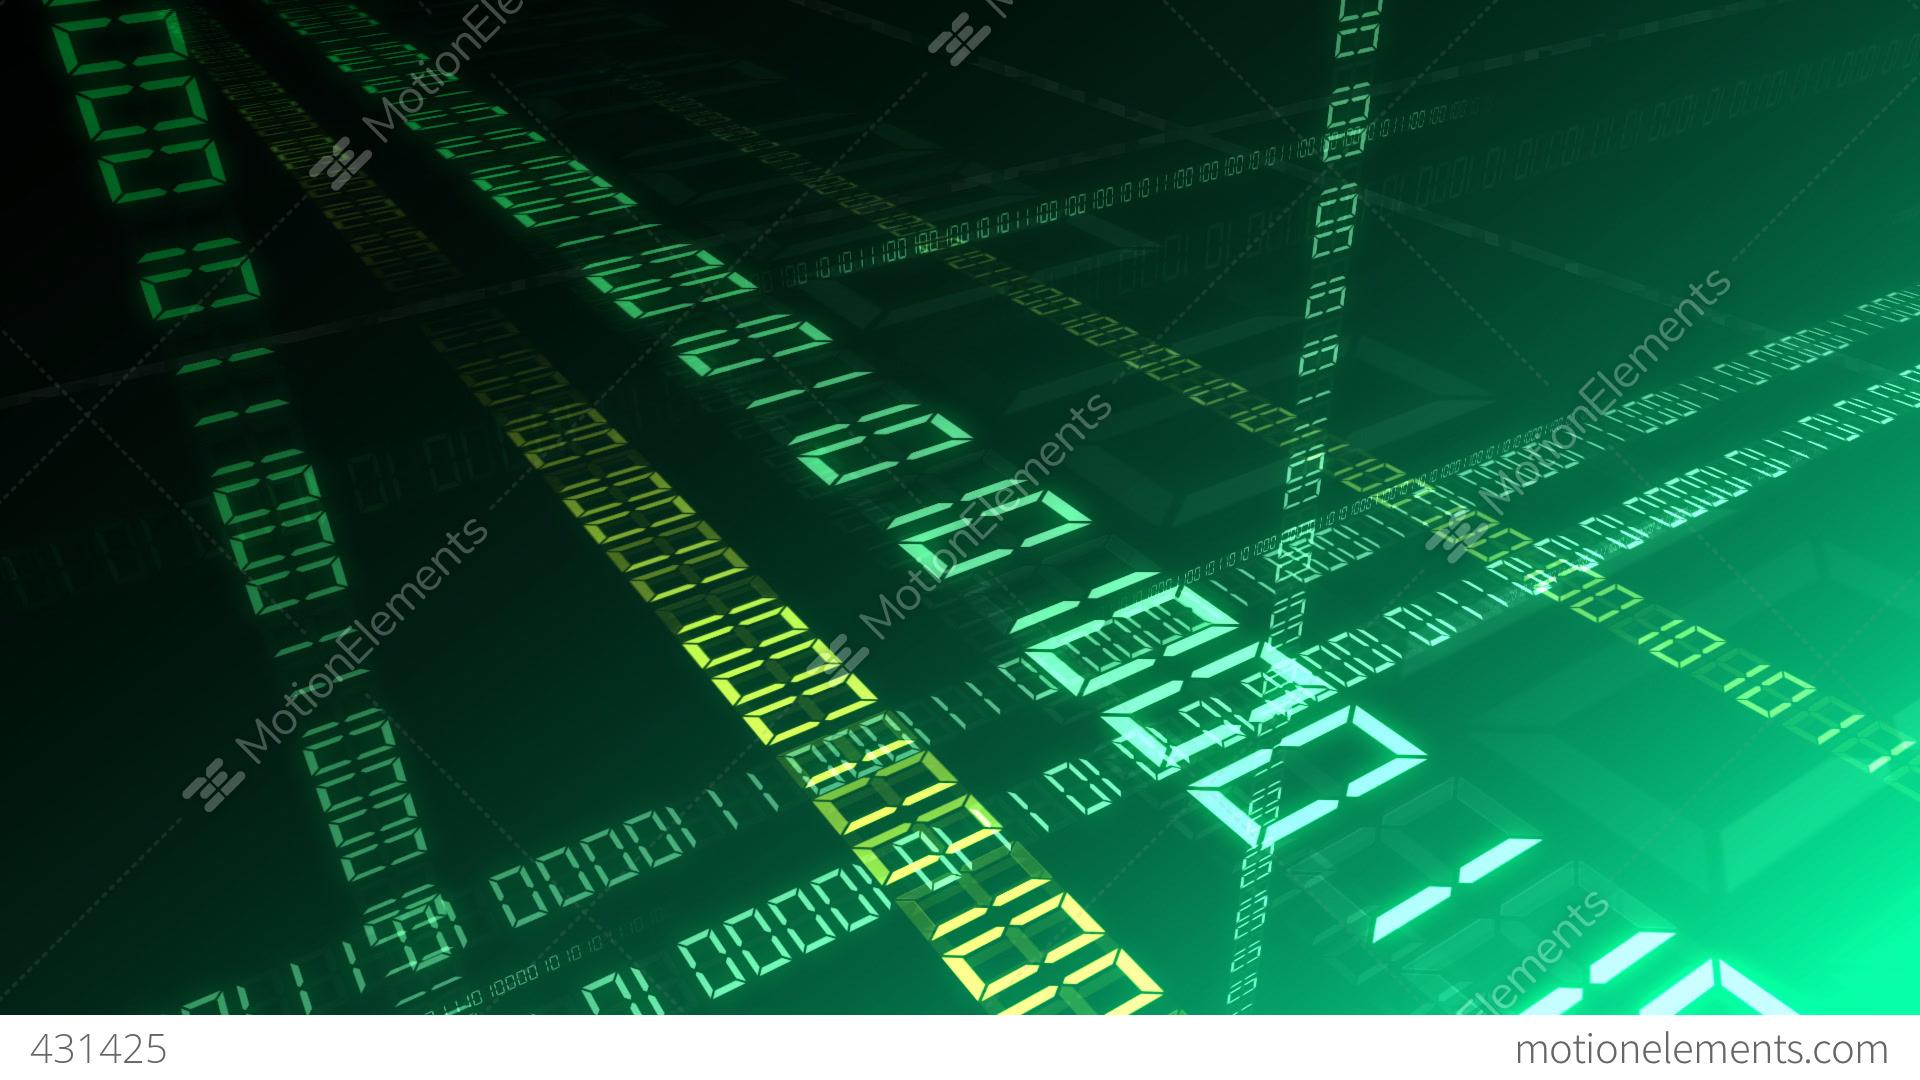 Computer Networking Wallpaper - WallpaperSafari